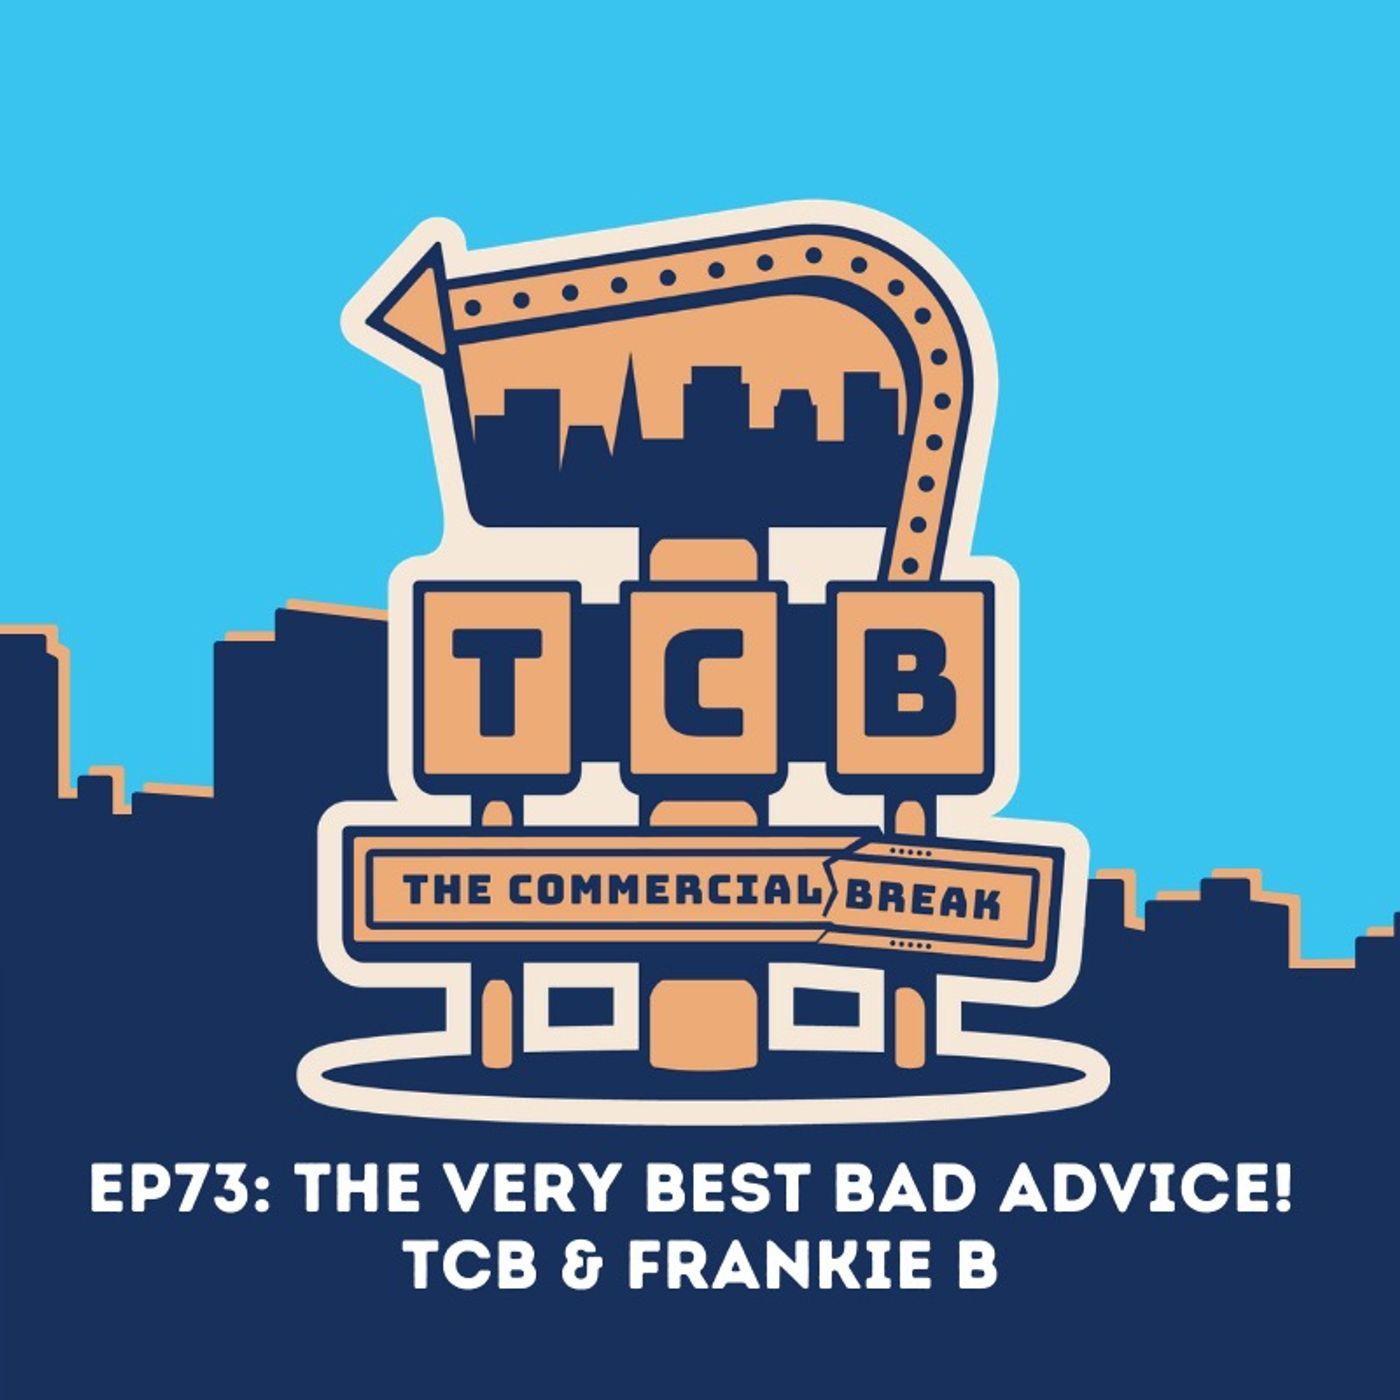 EP73: The Very Best Bad Advice | TCB & Frankie B